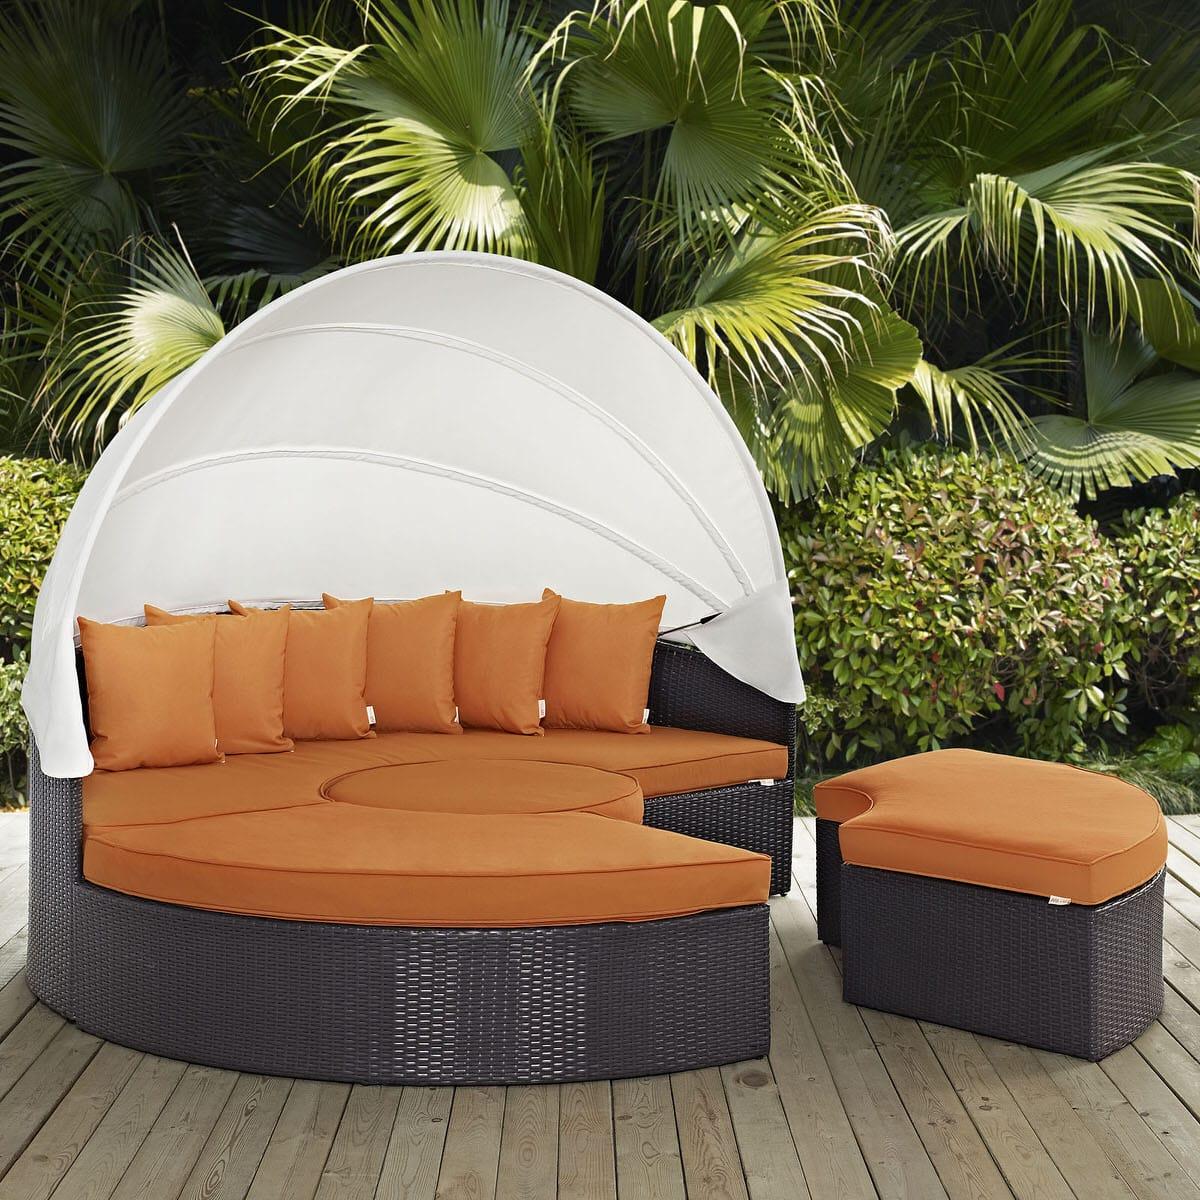 outdoor patio daybed. Outdoor Patio Daybed A